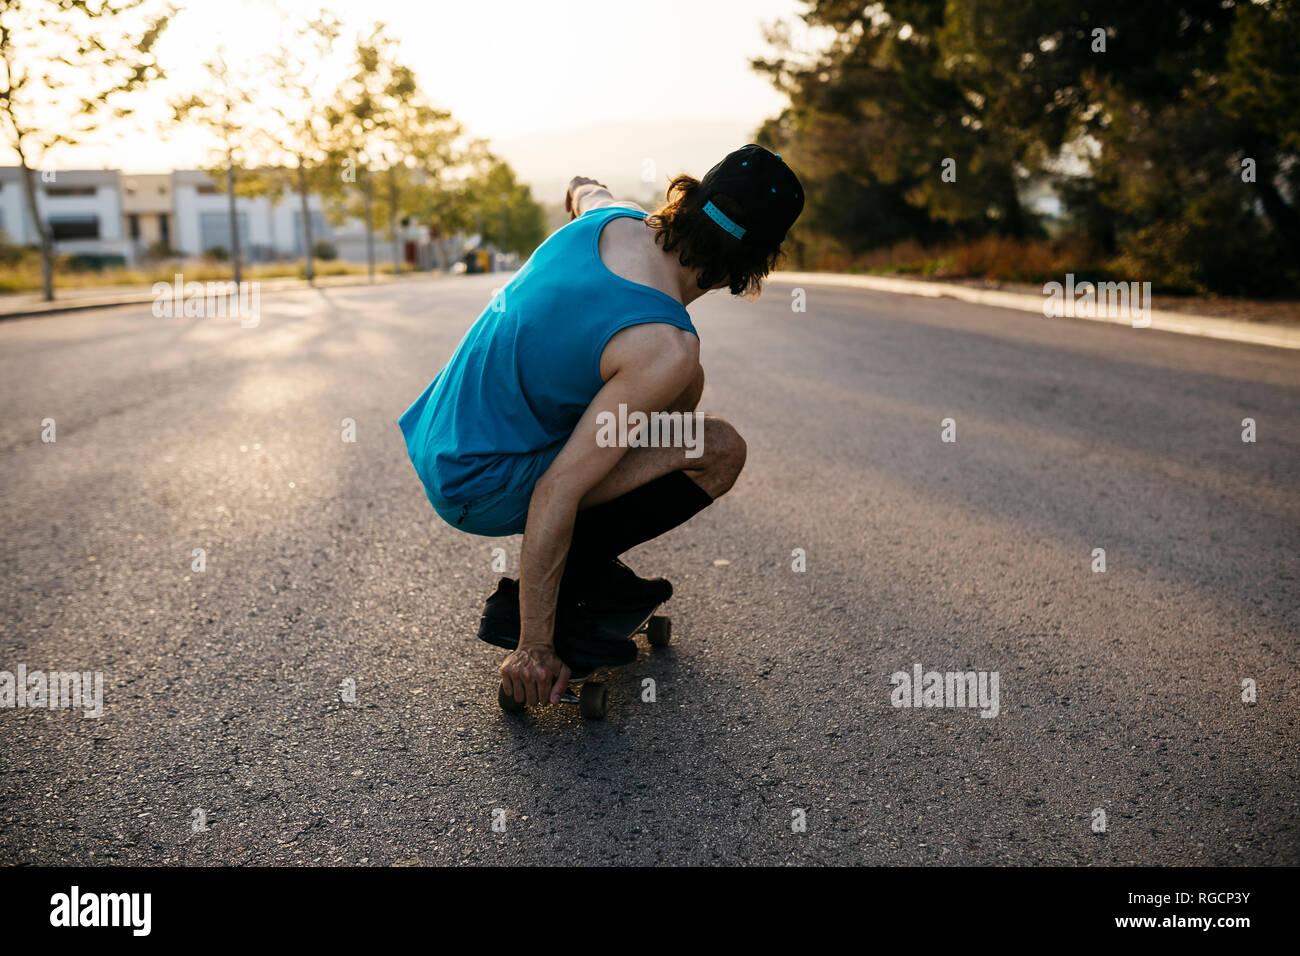 Mann skateboarding auf leere Raos bei Sonnenuntergang Stockfoto